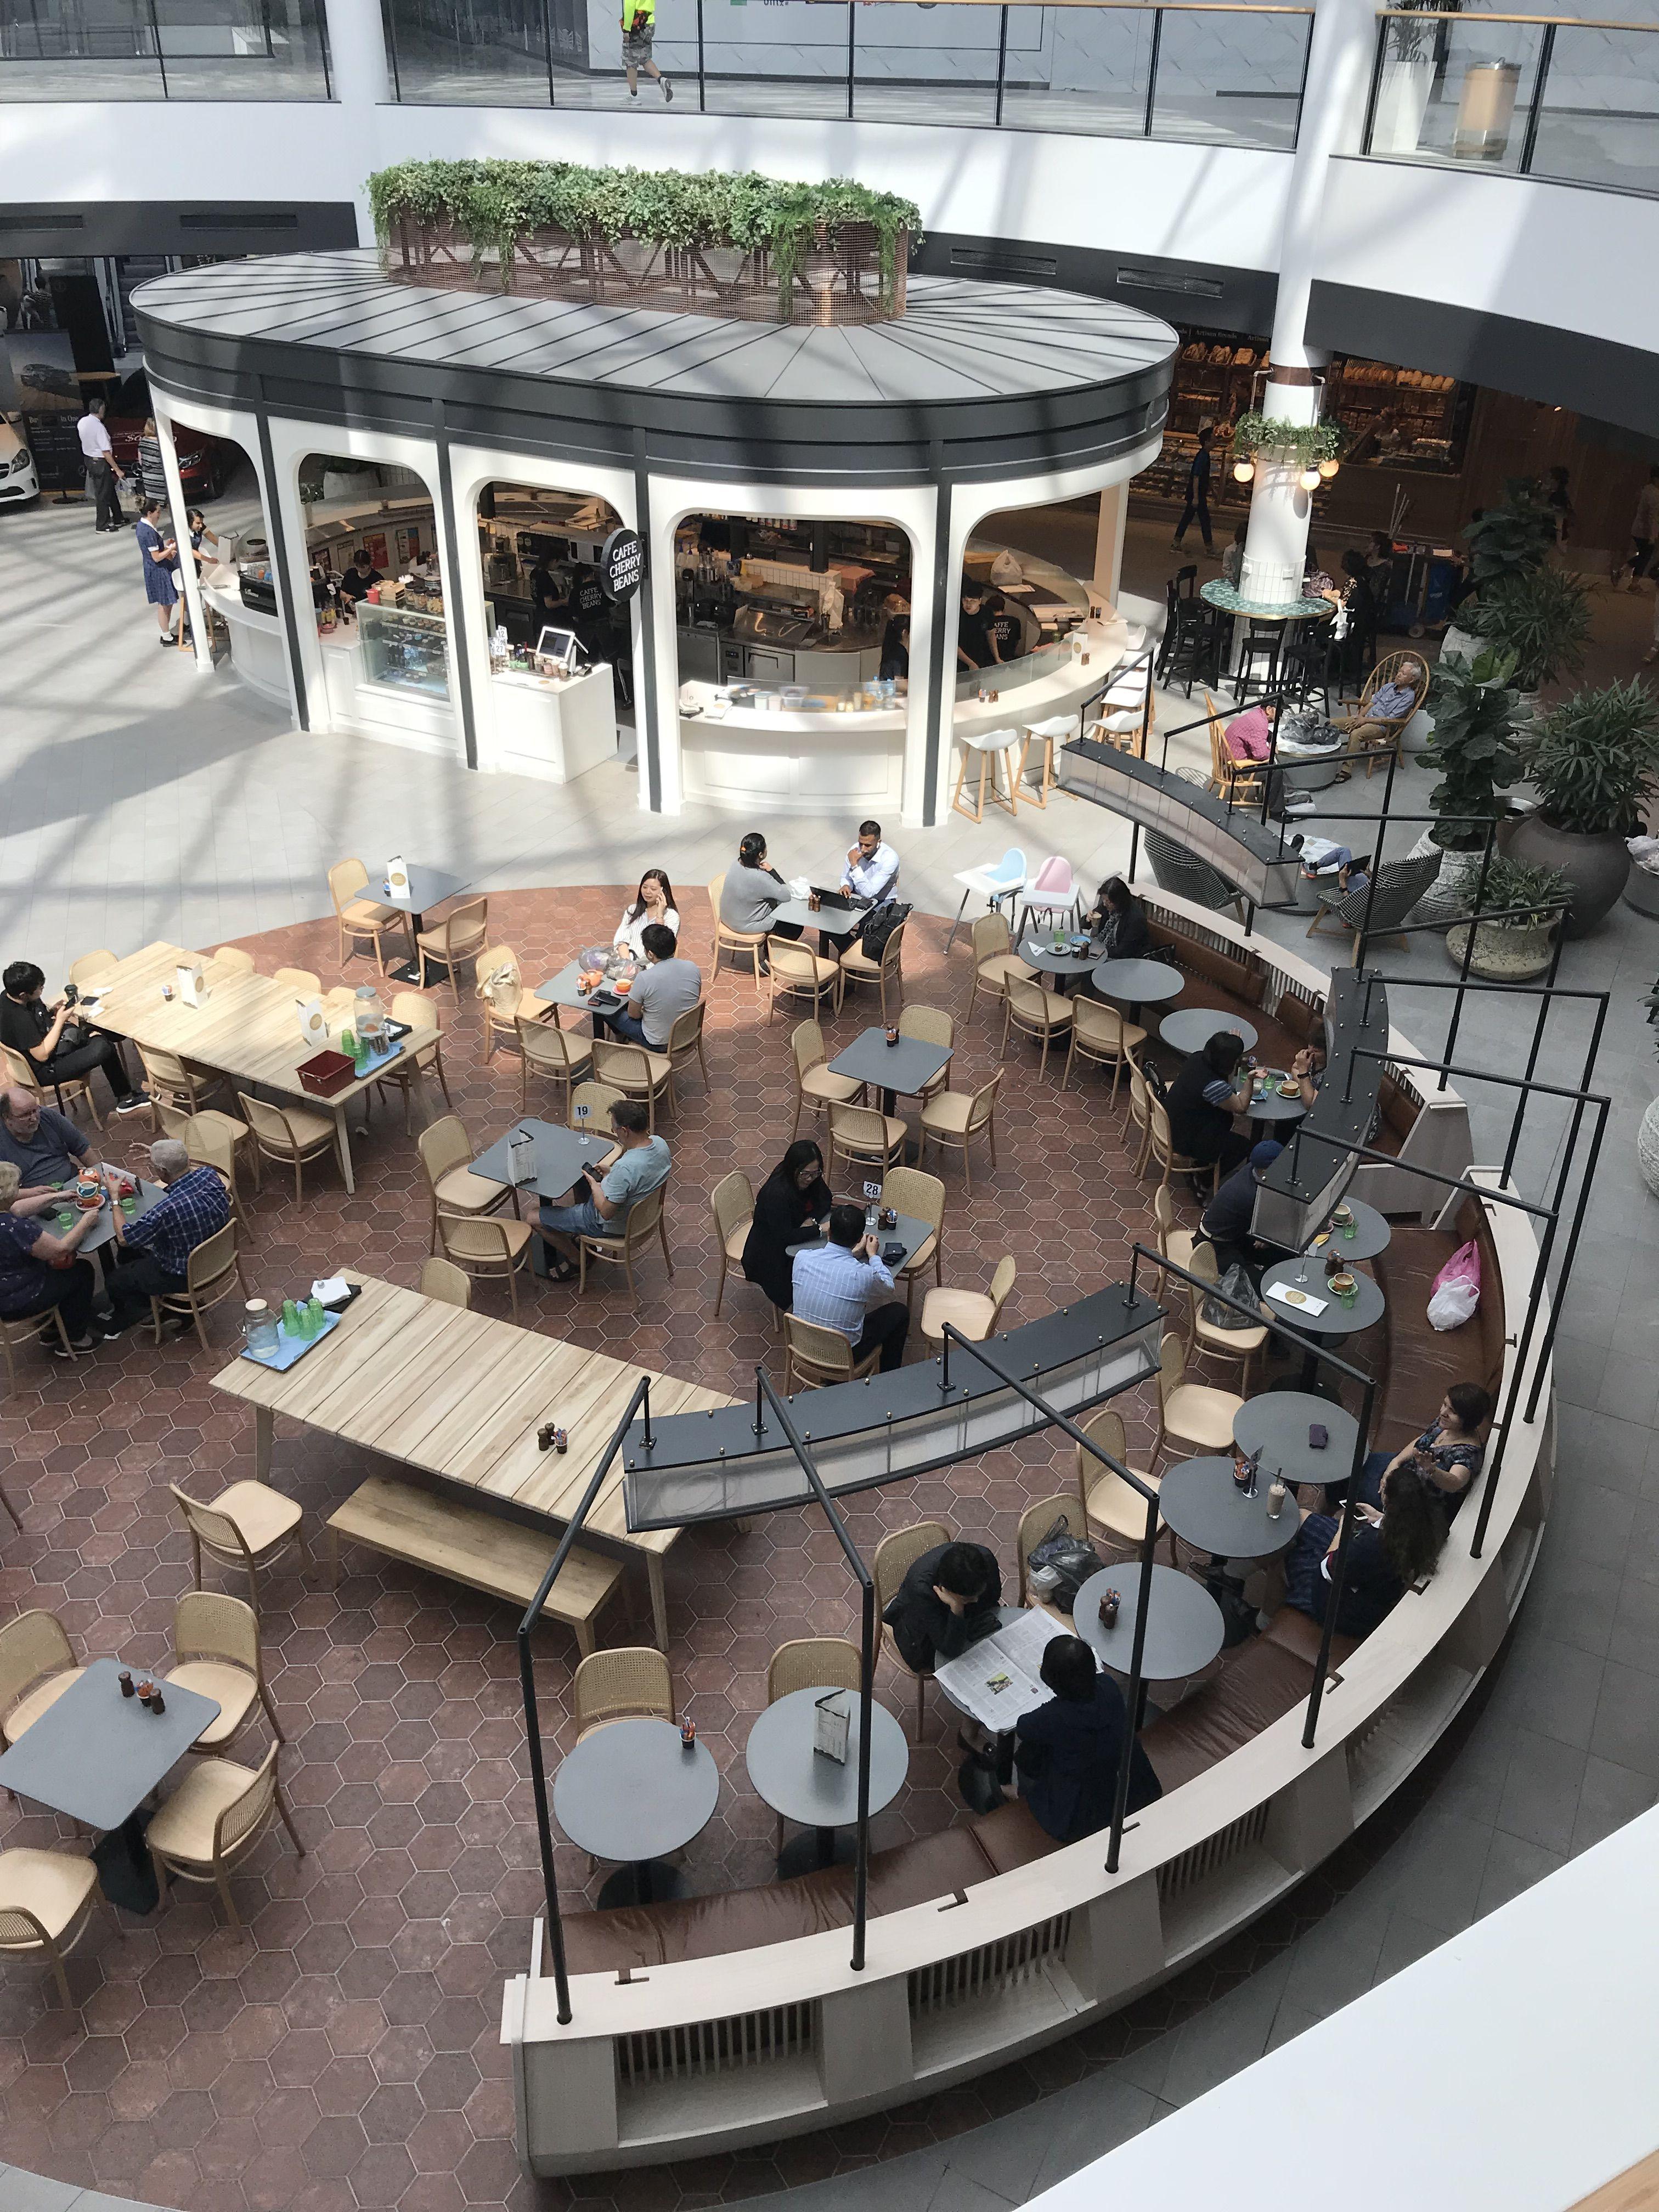 Img 3442 Food Court Design Bar Design Restaurant Shopping Mall Interior